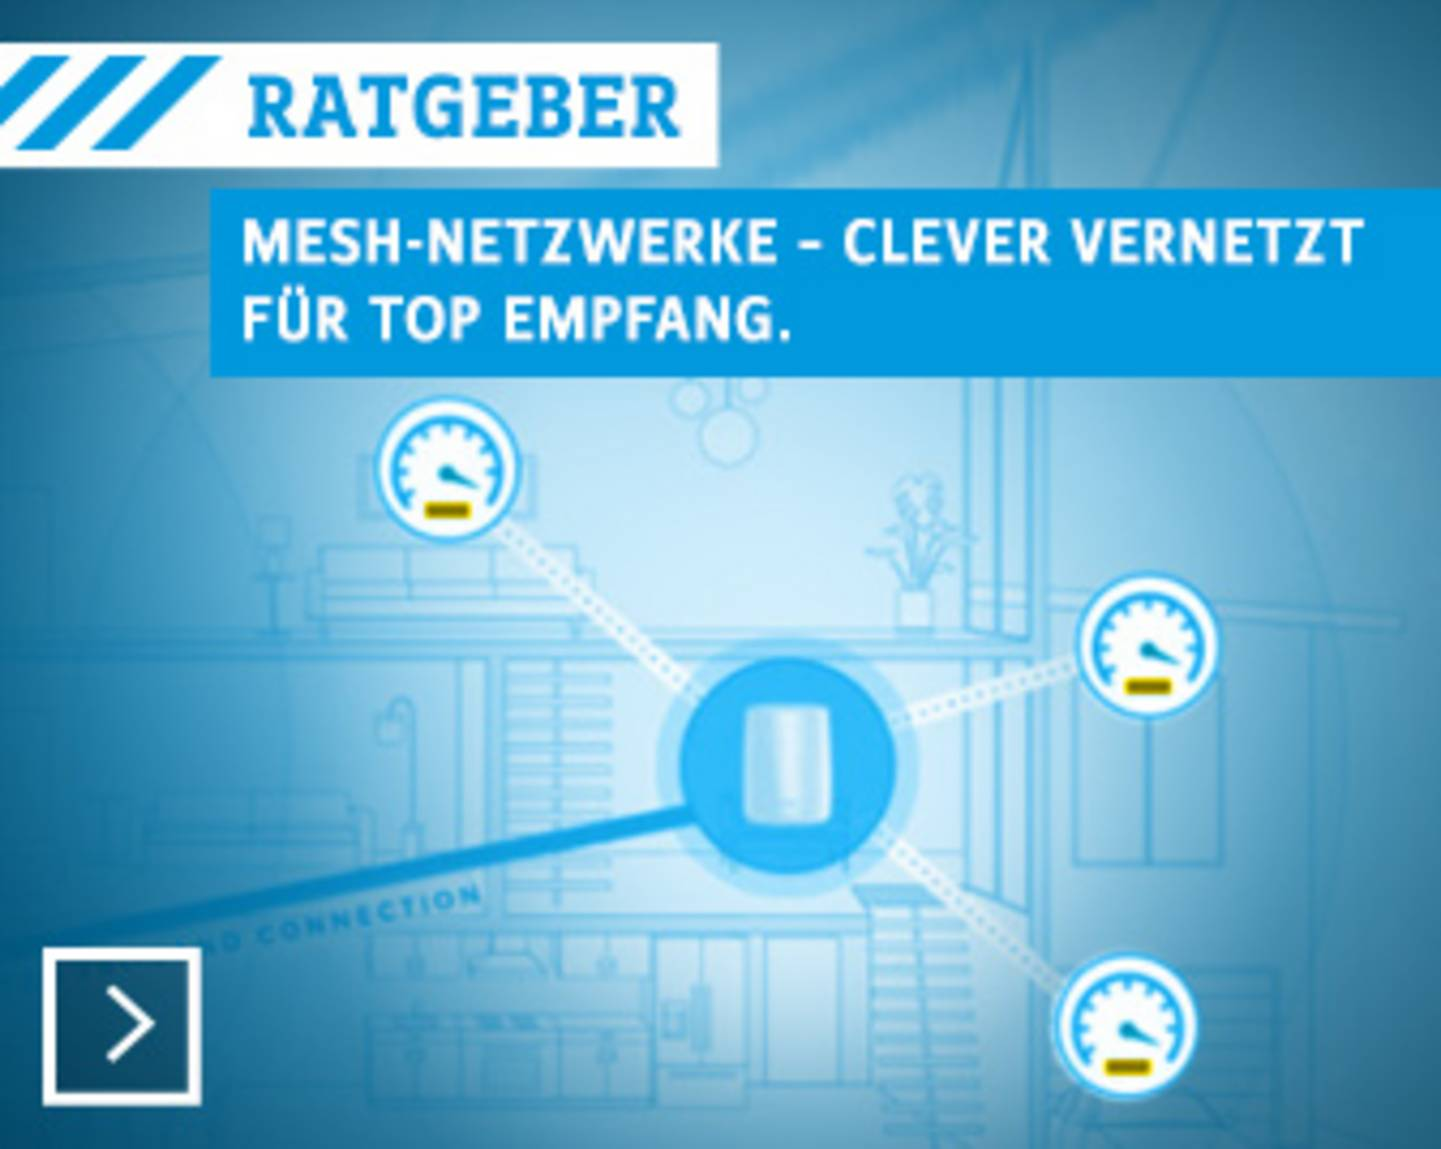 Ratgeber Mesh-Netzwerke